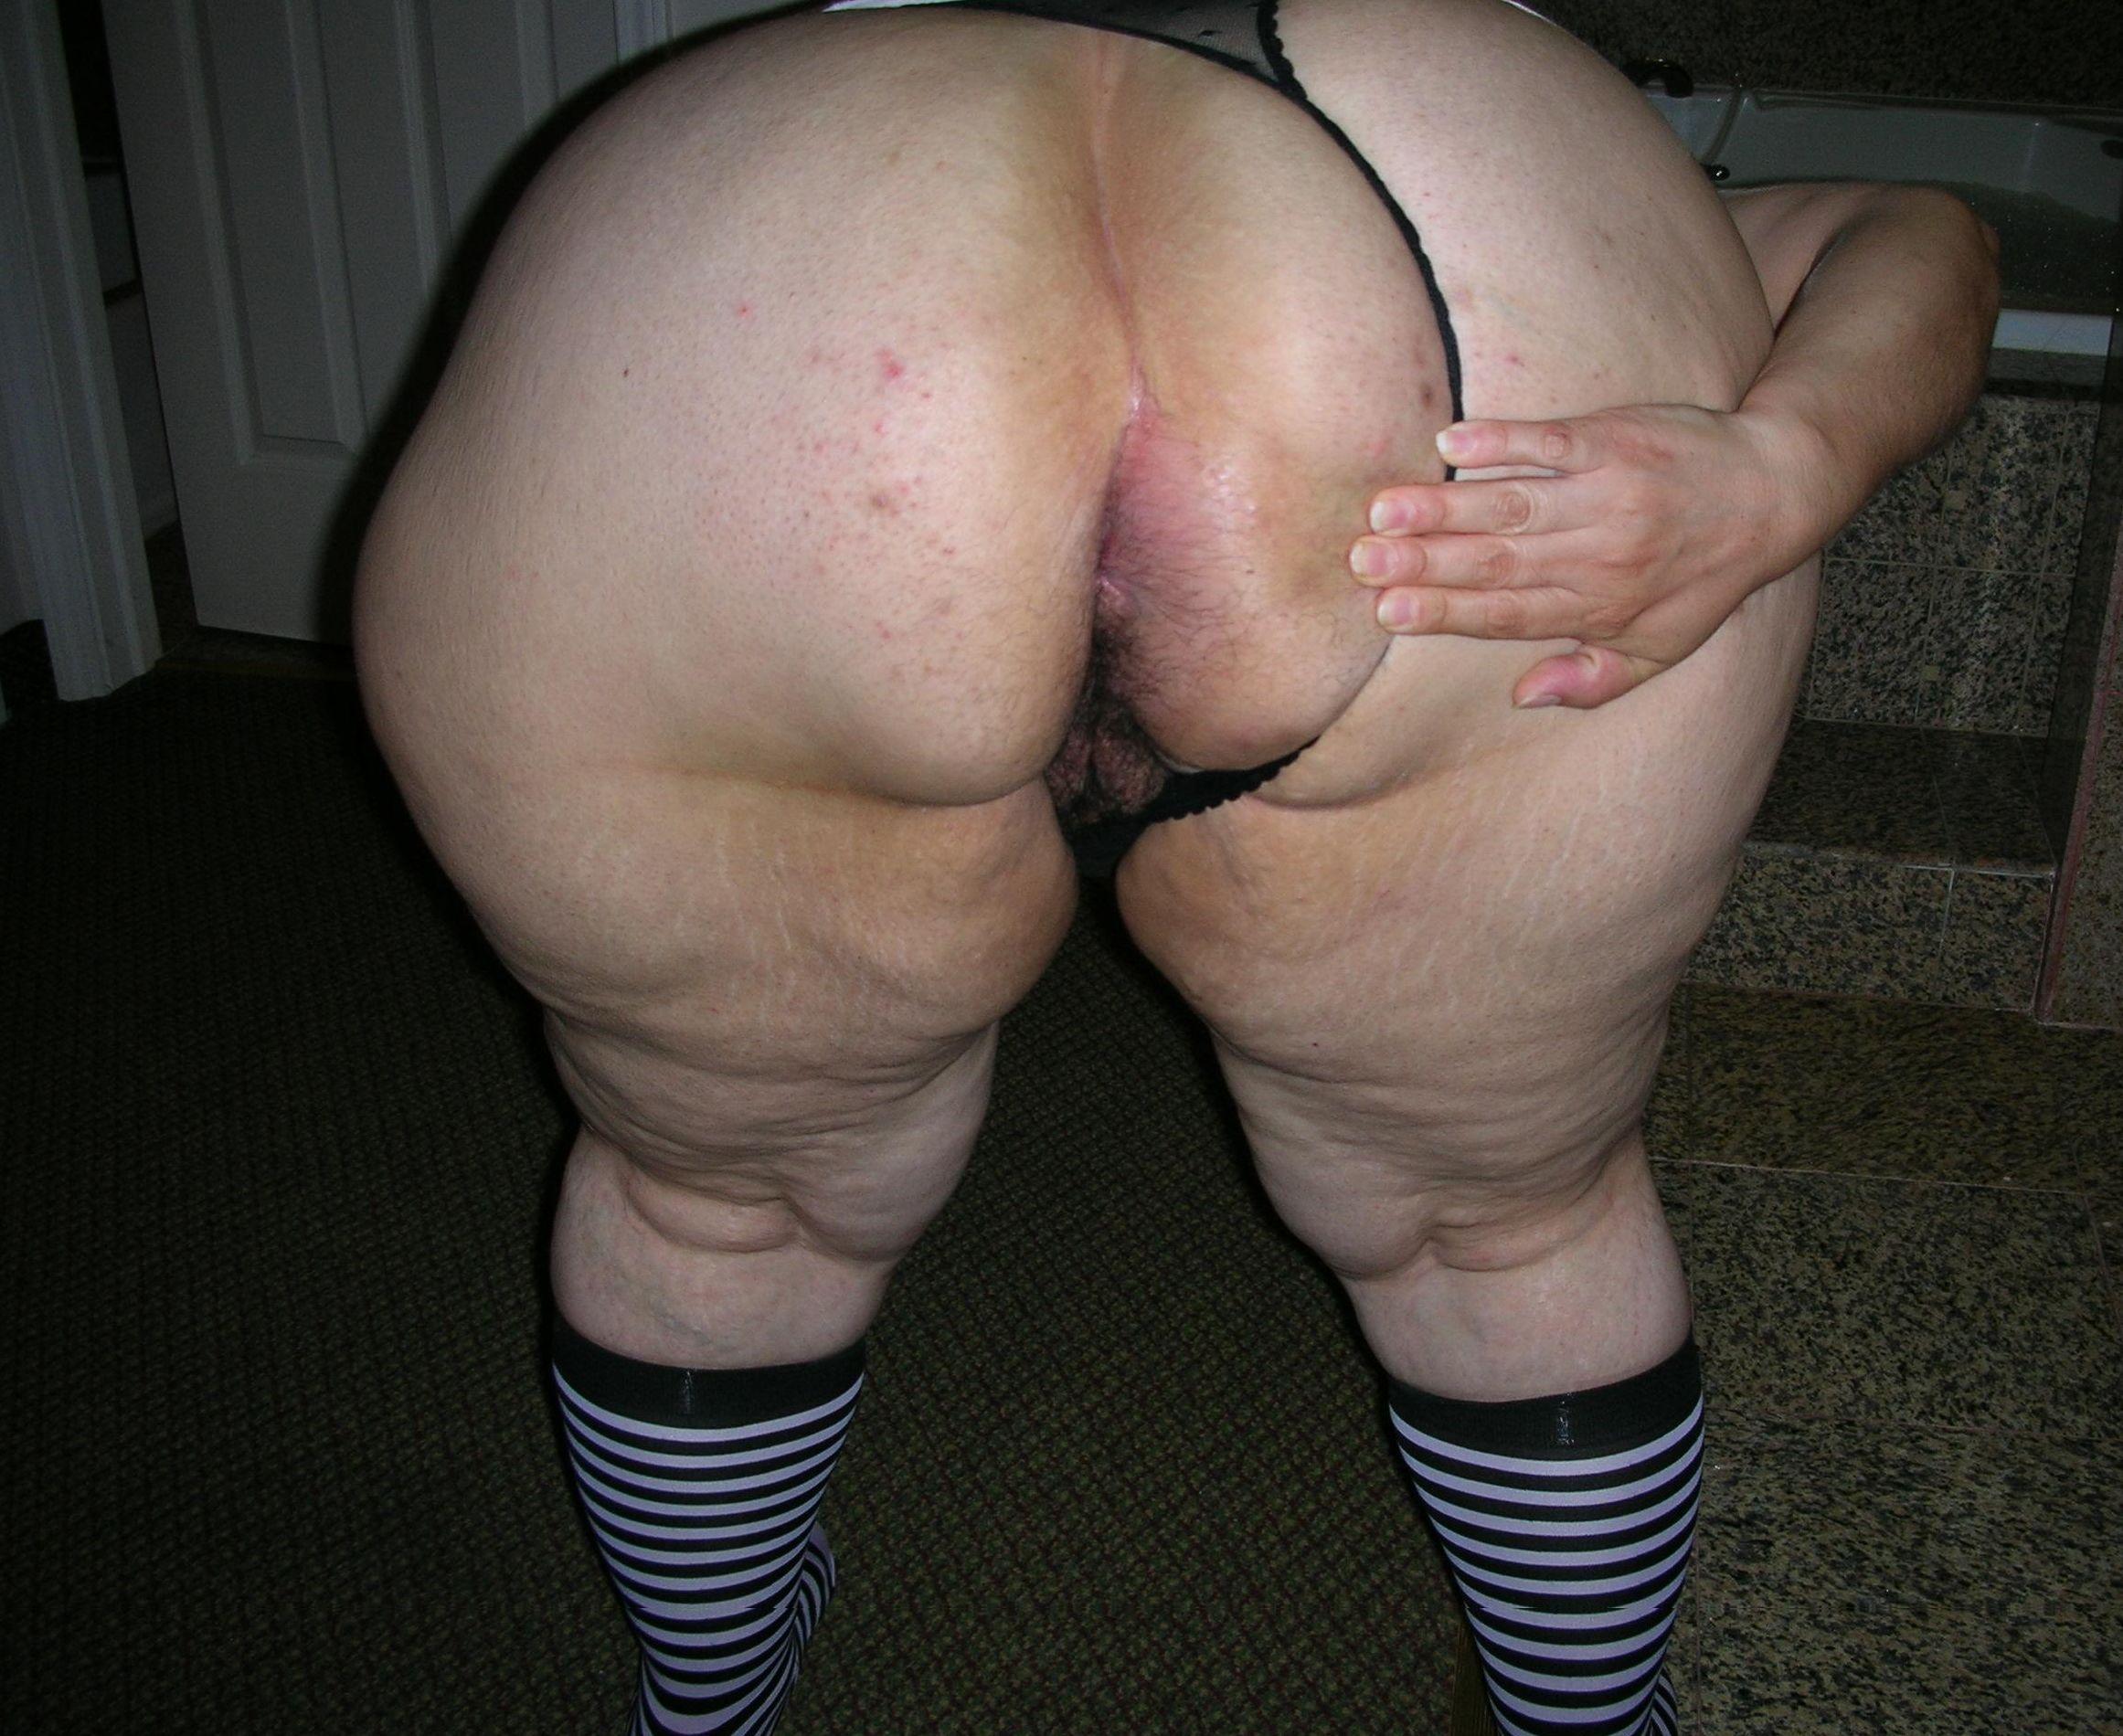 elizabeth bracco nude